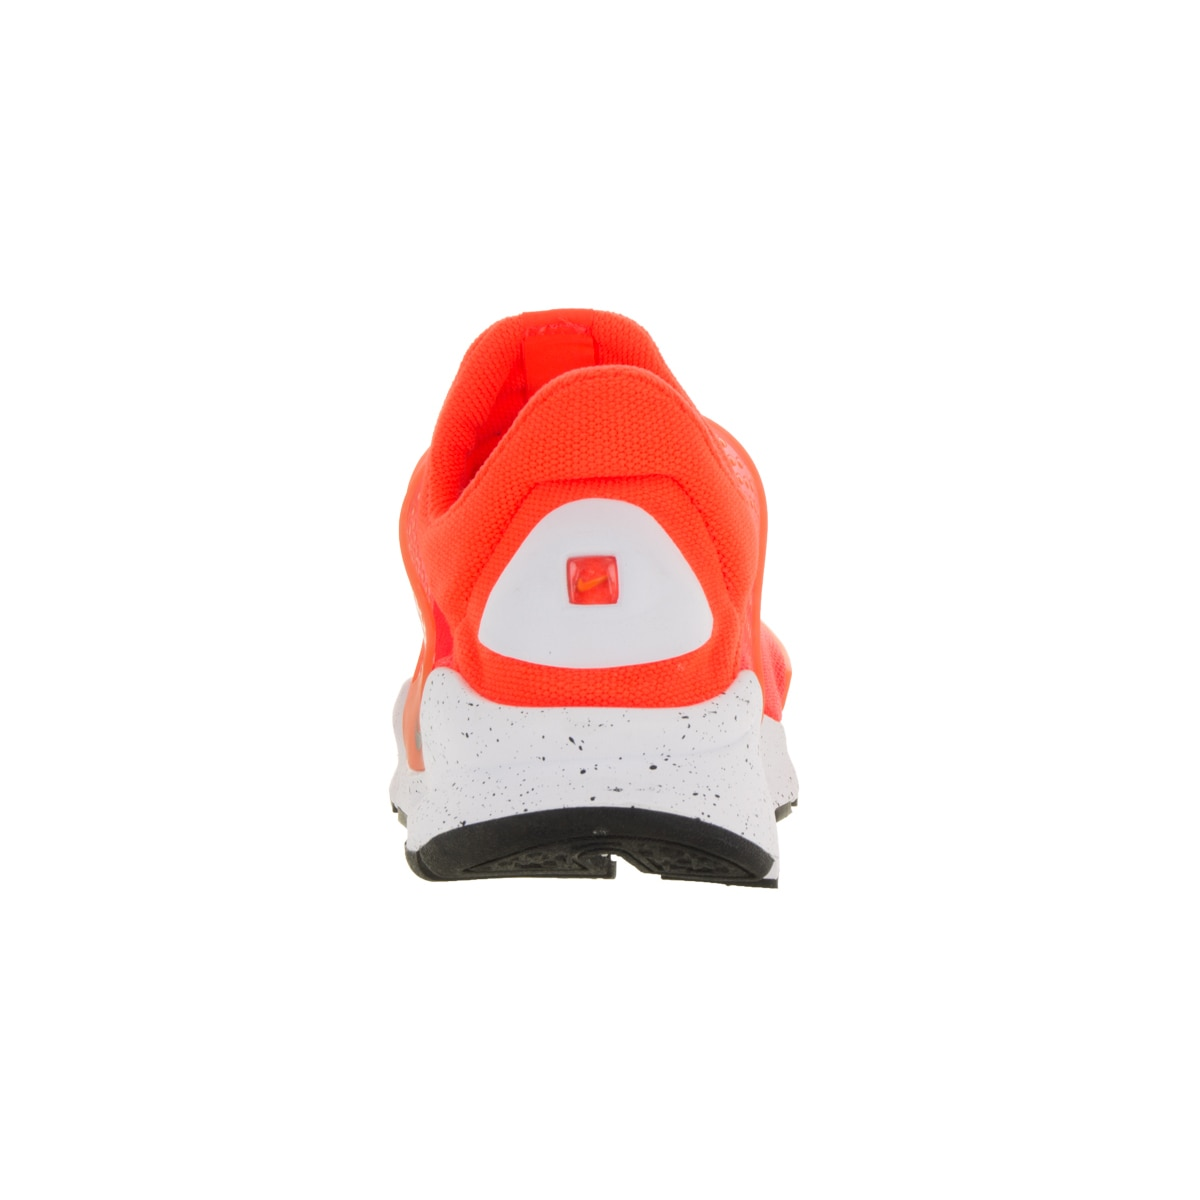 1ea81221b9be Shop Nike Men s Sock Dart SE Total Crimson Black White Running Shoe - Free  Shipping Today - Overstock - 13394505